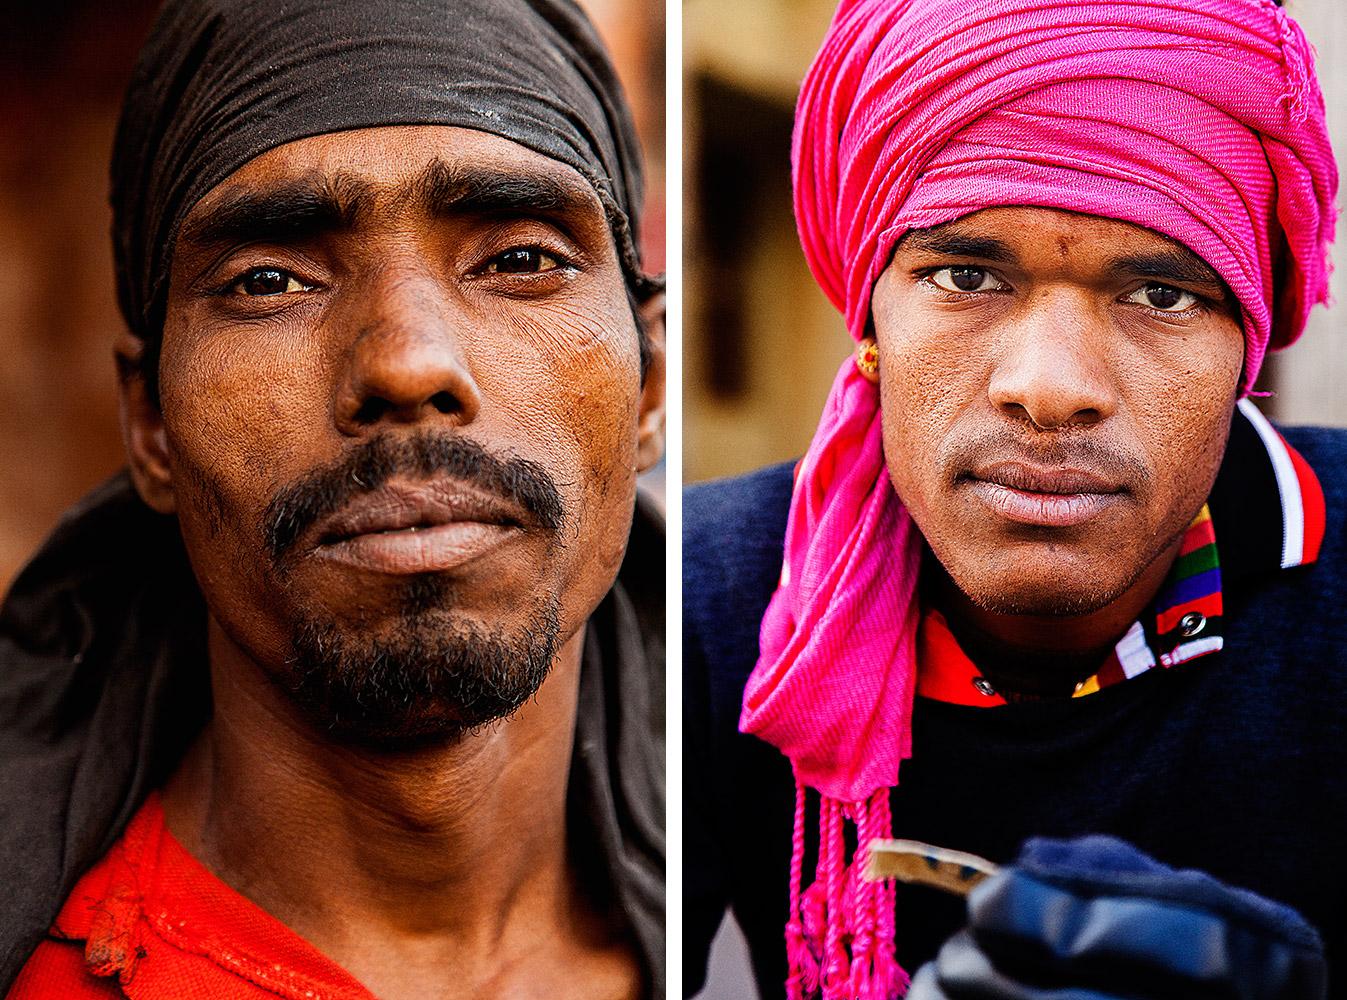 India-Portraits-DUO-002.jpg